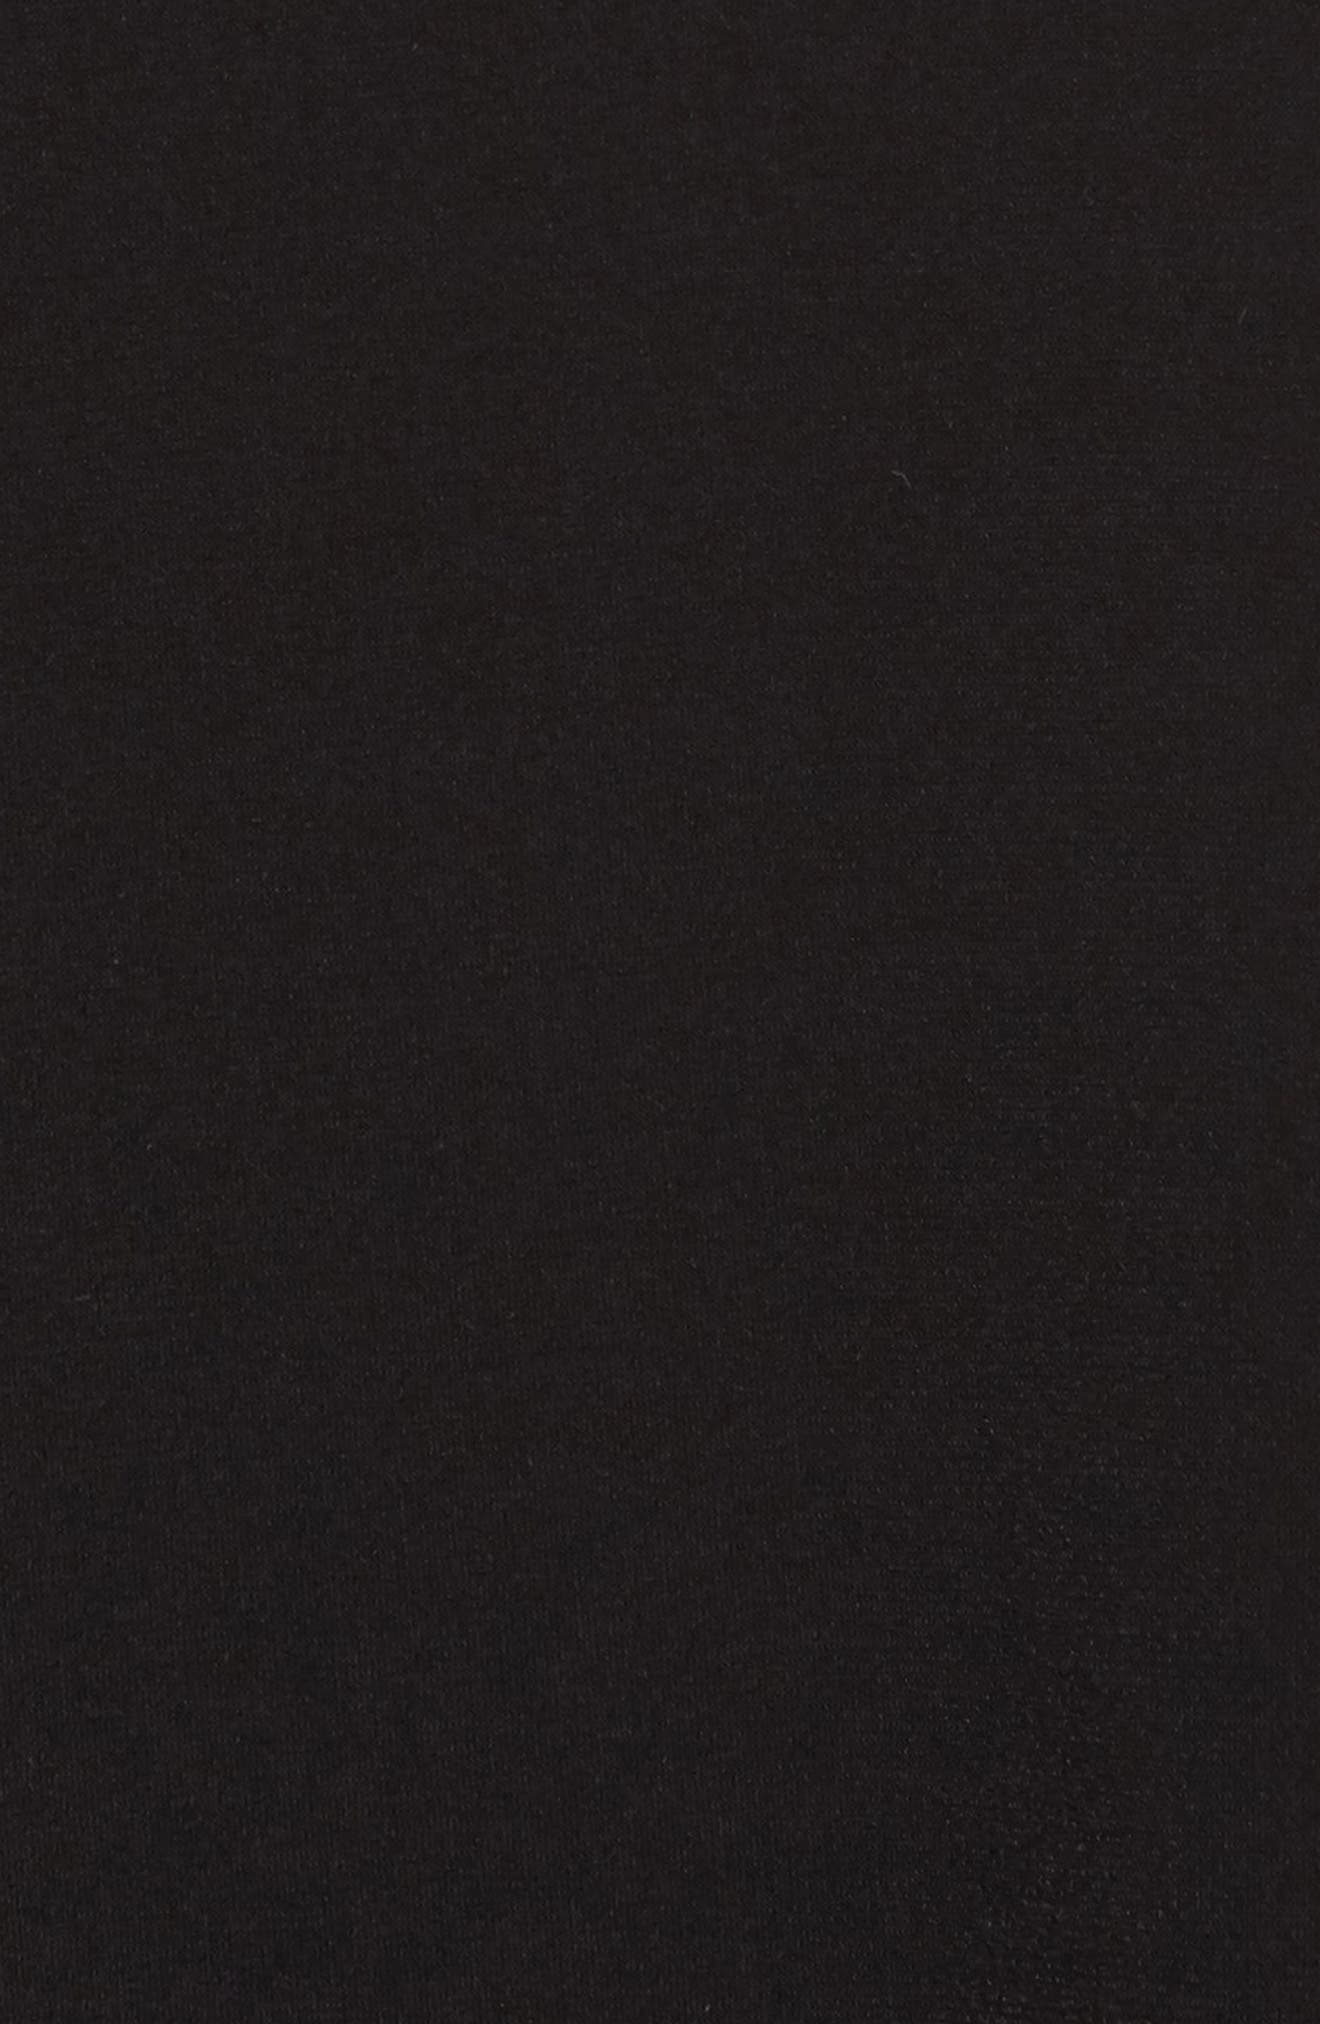 Stripe Bell Sleeve Top,                             Alternate thumbnail 6, color,                             Black